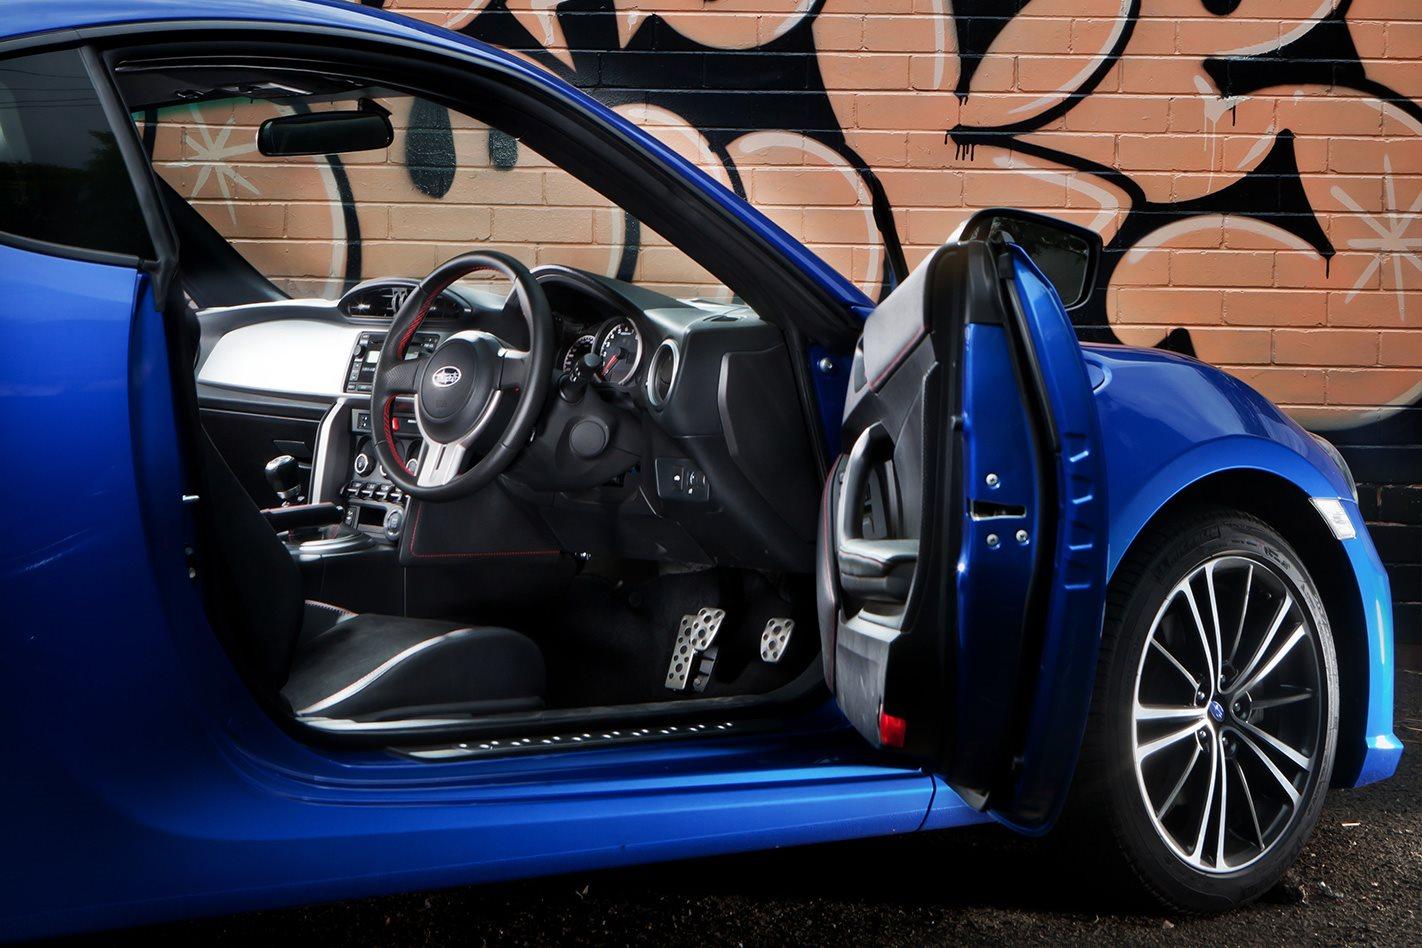 2012-Subaru-BRZ-interior.jpg